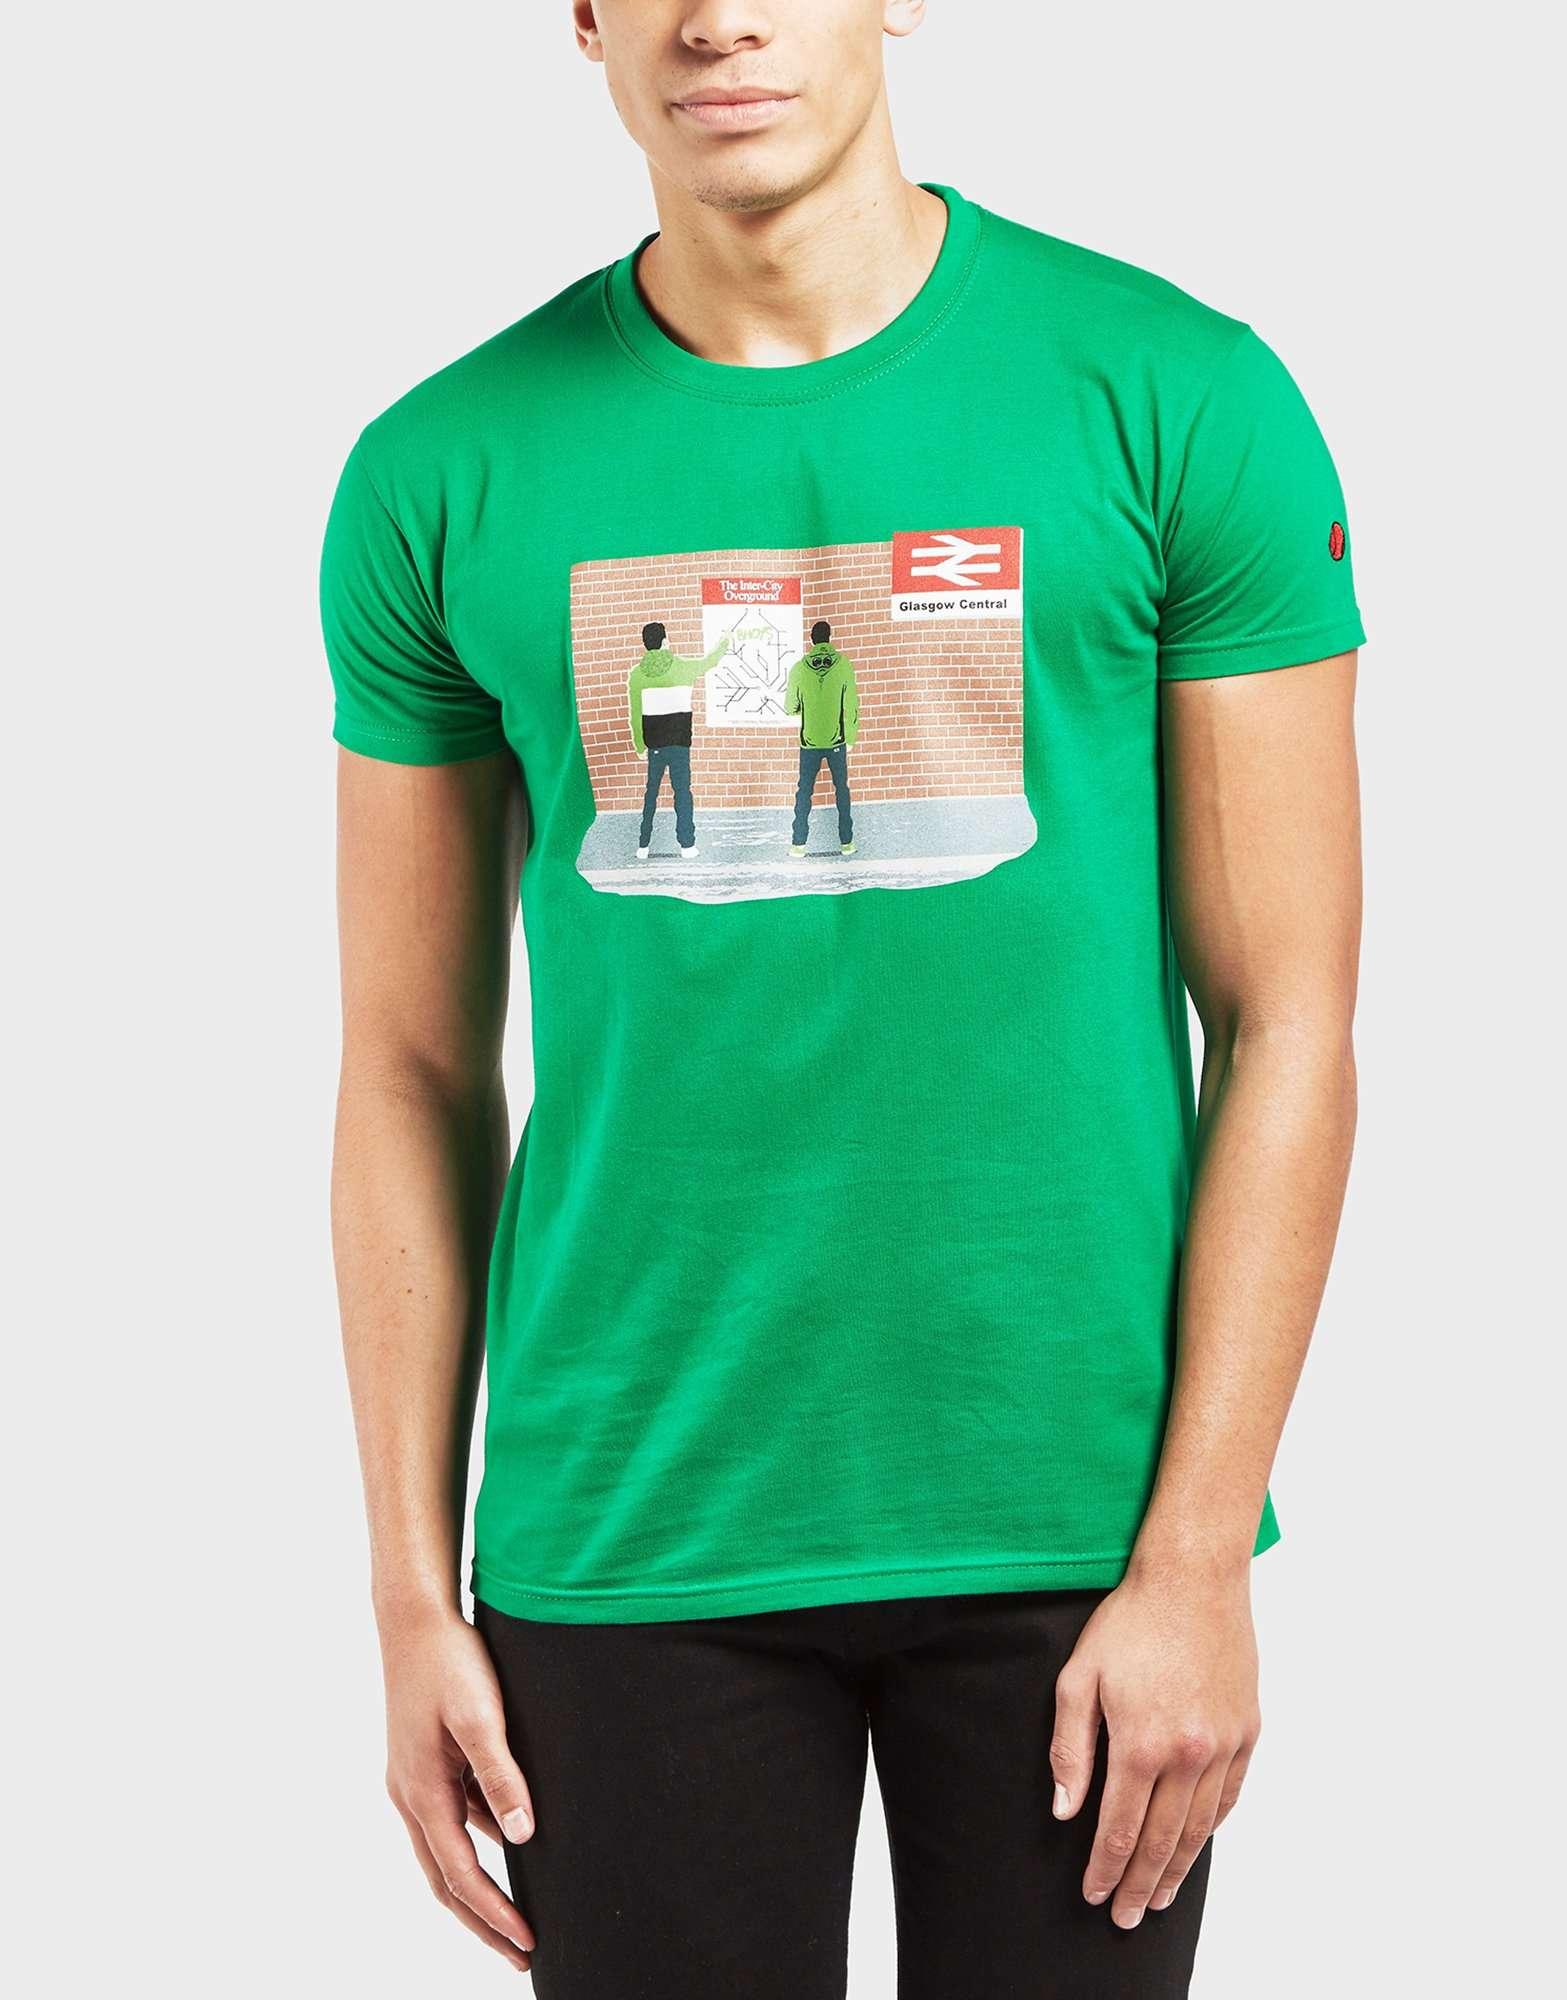 6f0d60f5 80s Casuals Celtic Short Sleeve T-Shirt - Exclusive | scotts Menswear